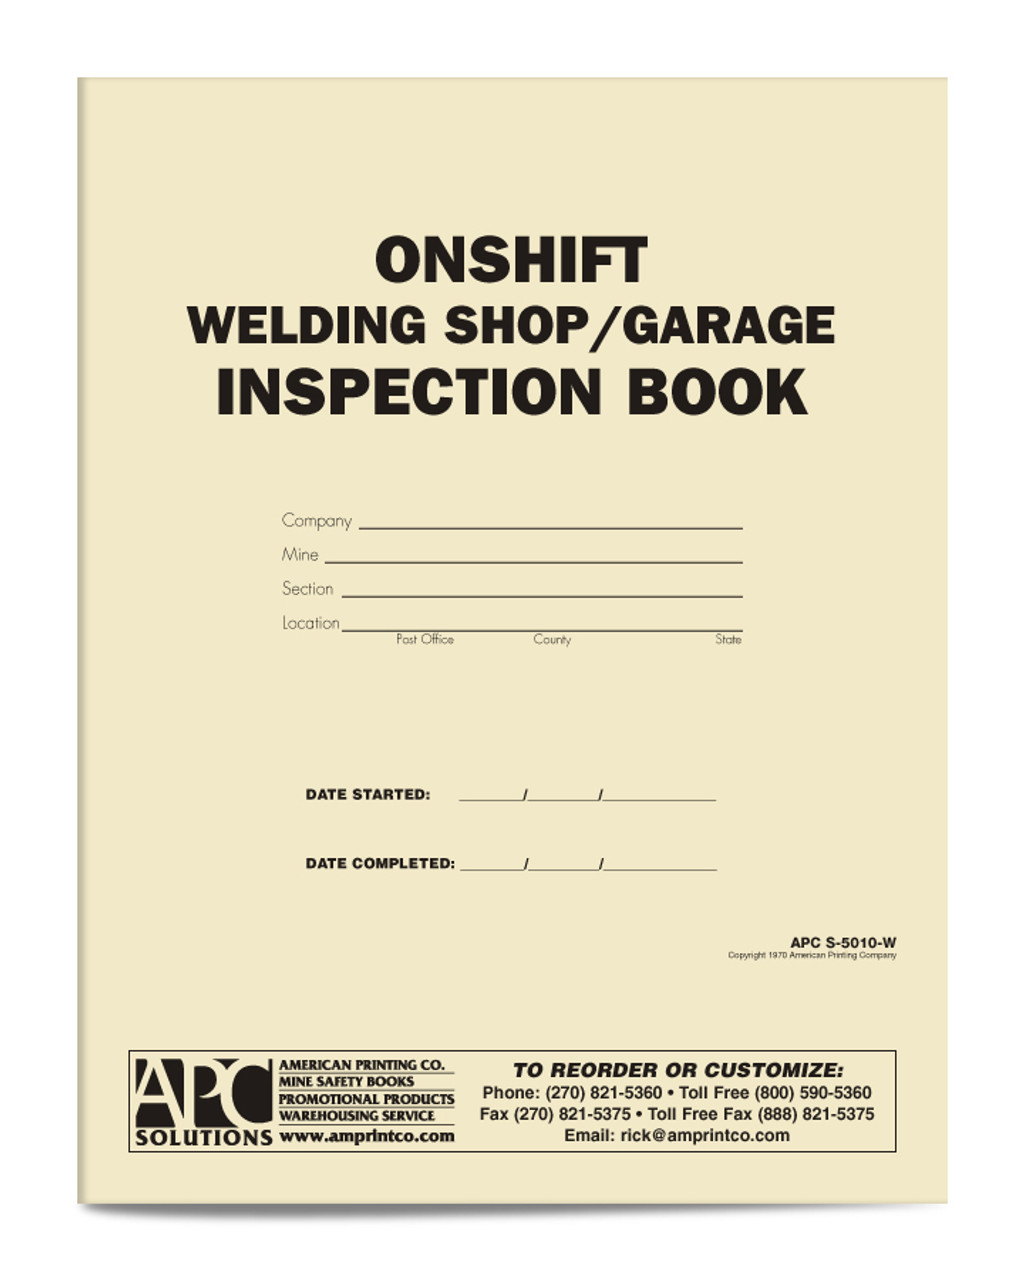 APC S-5010-W: Onshift Welding Shop/Garage Inspection Book